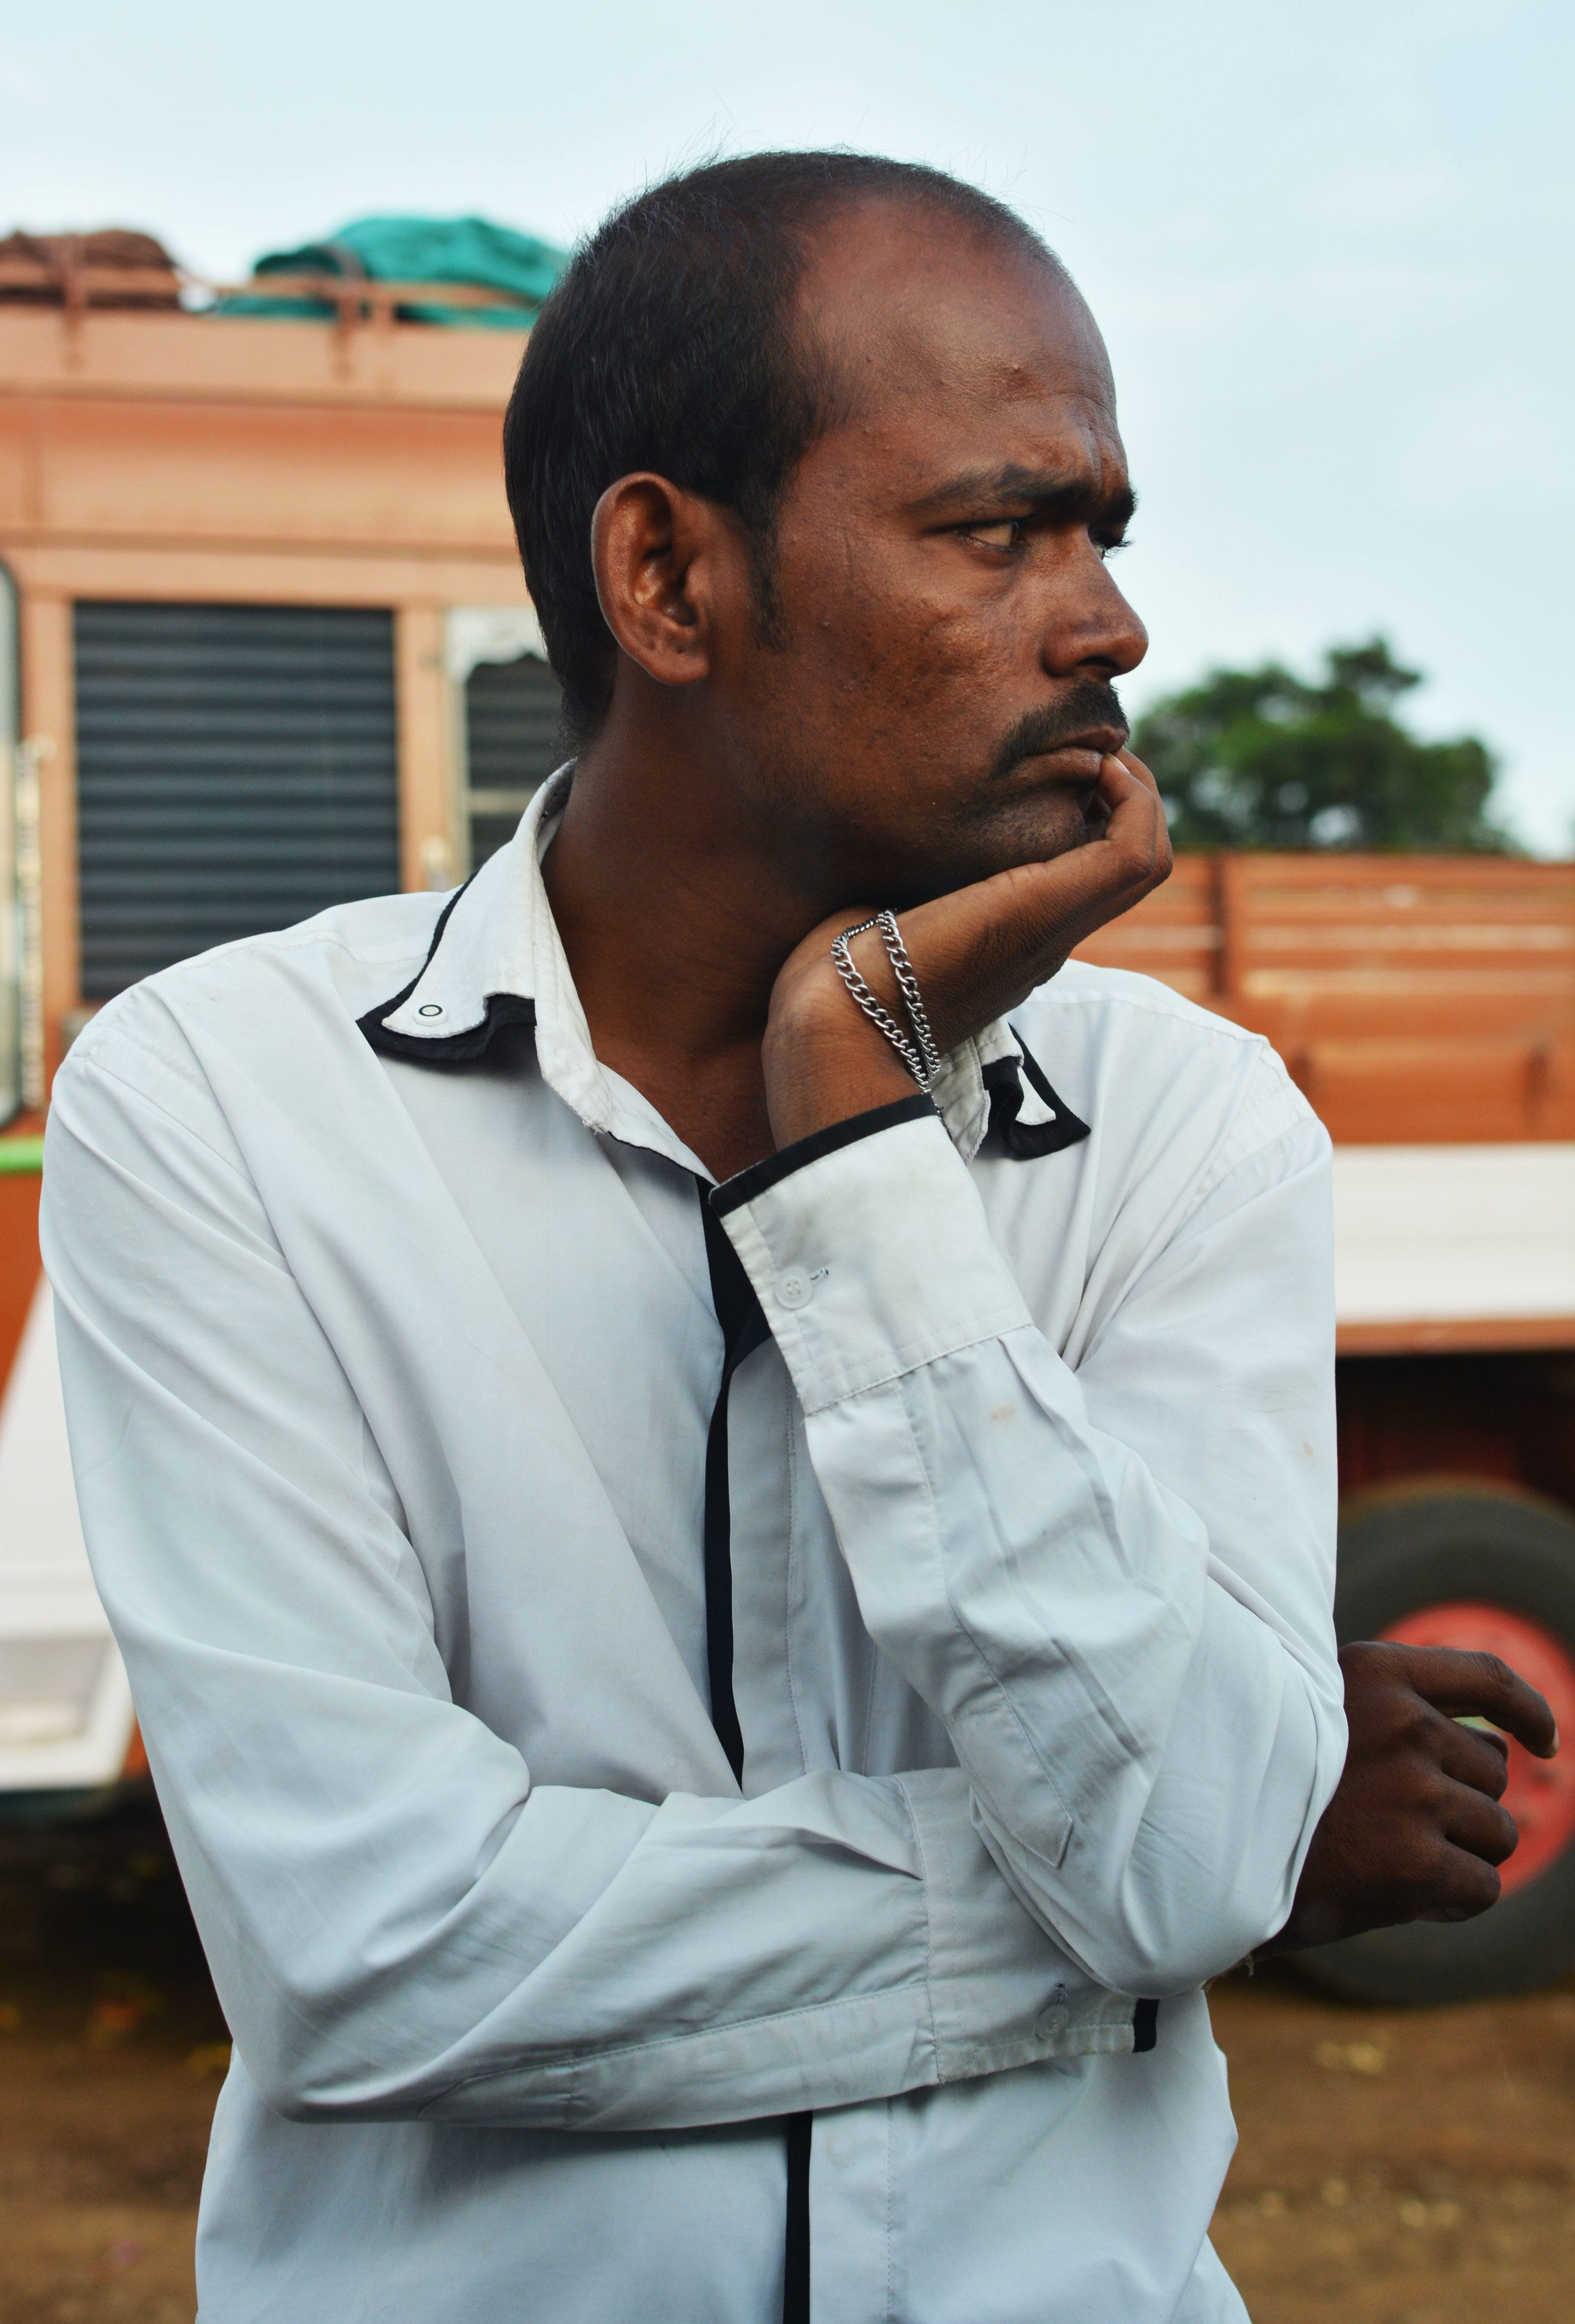 man thinking with chain.jpg